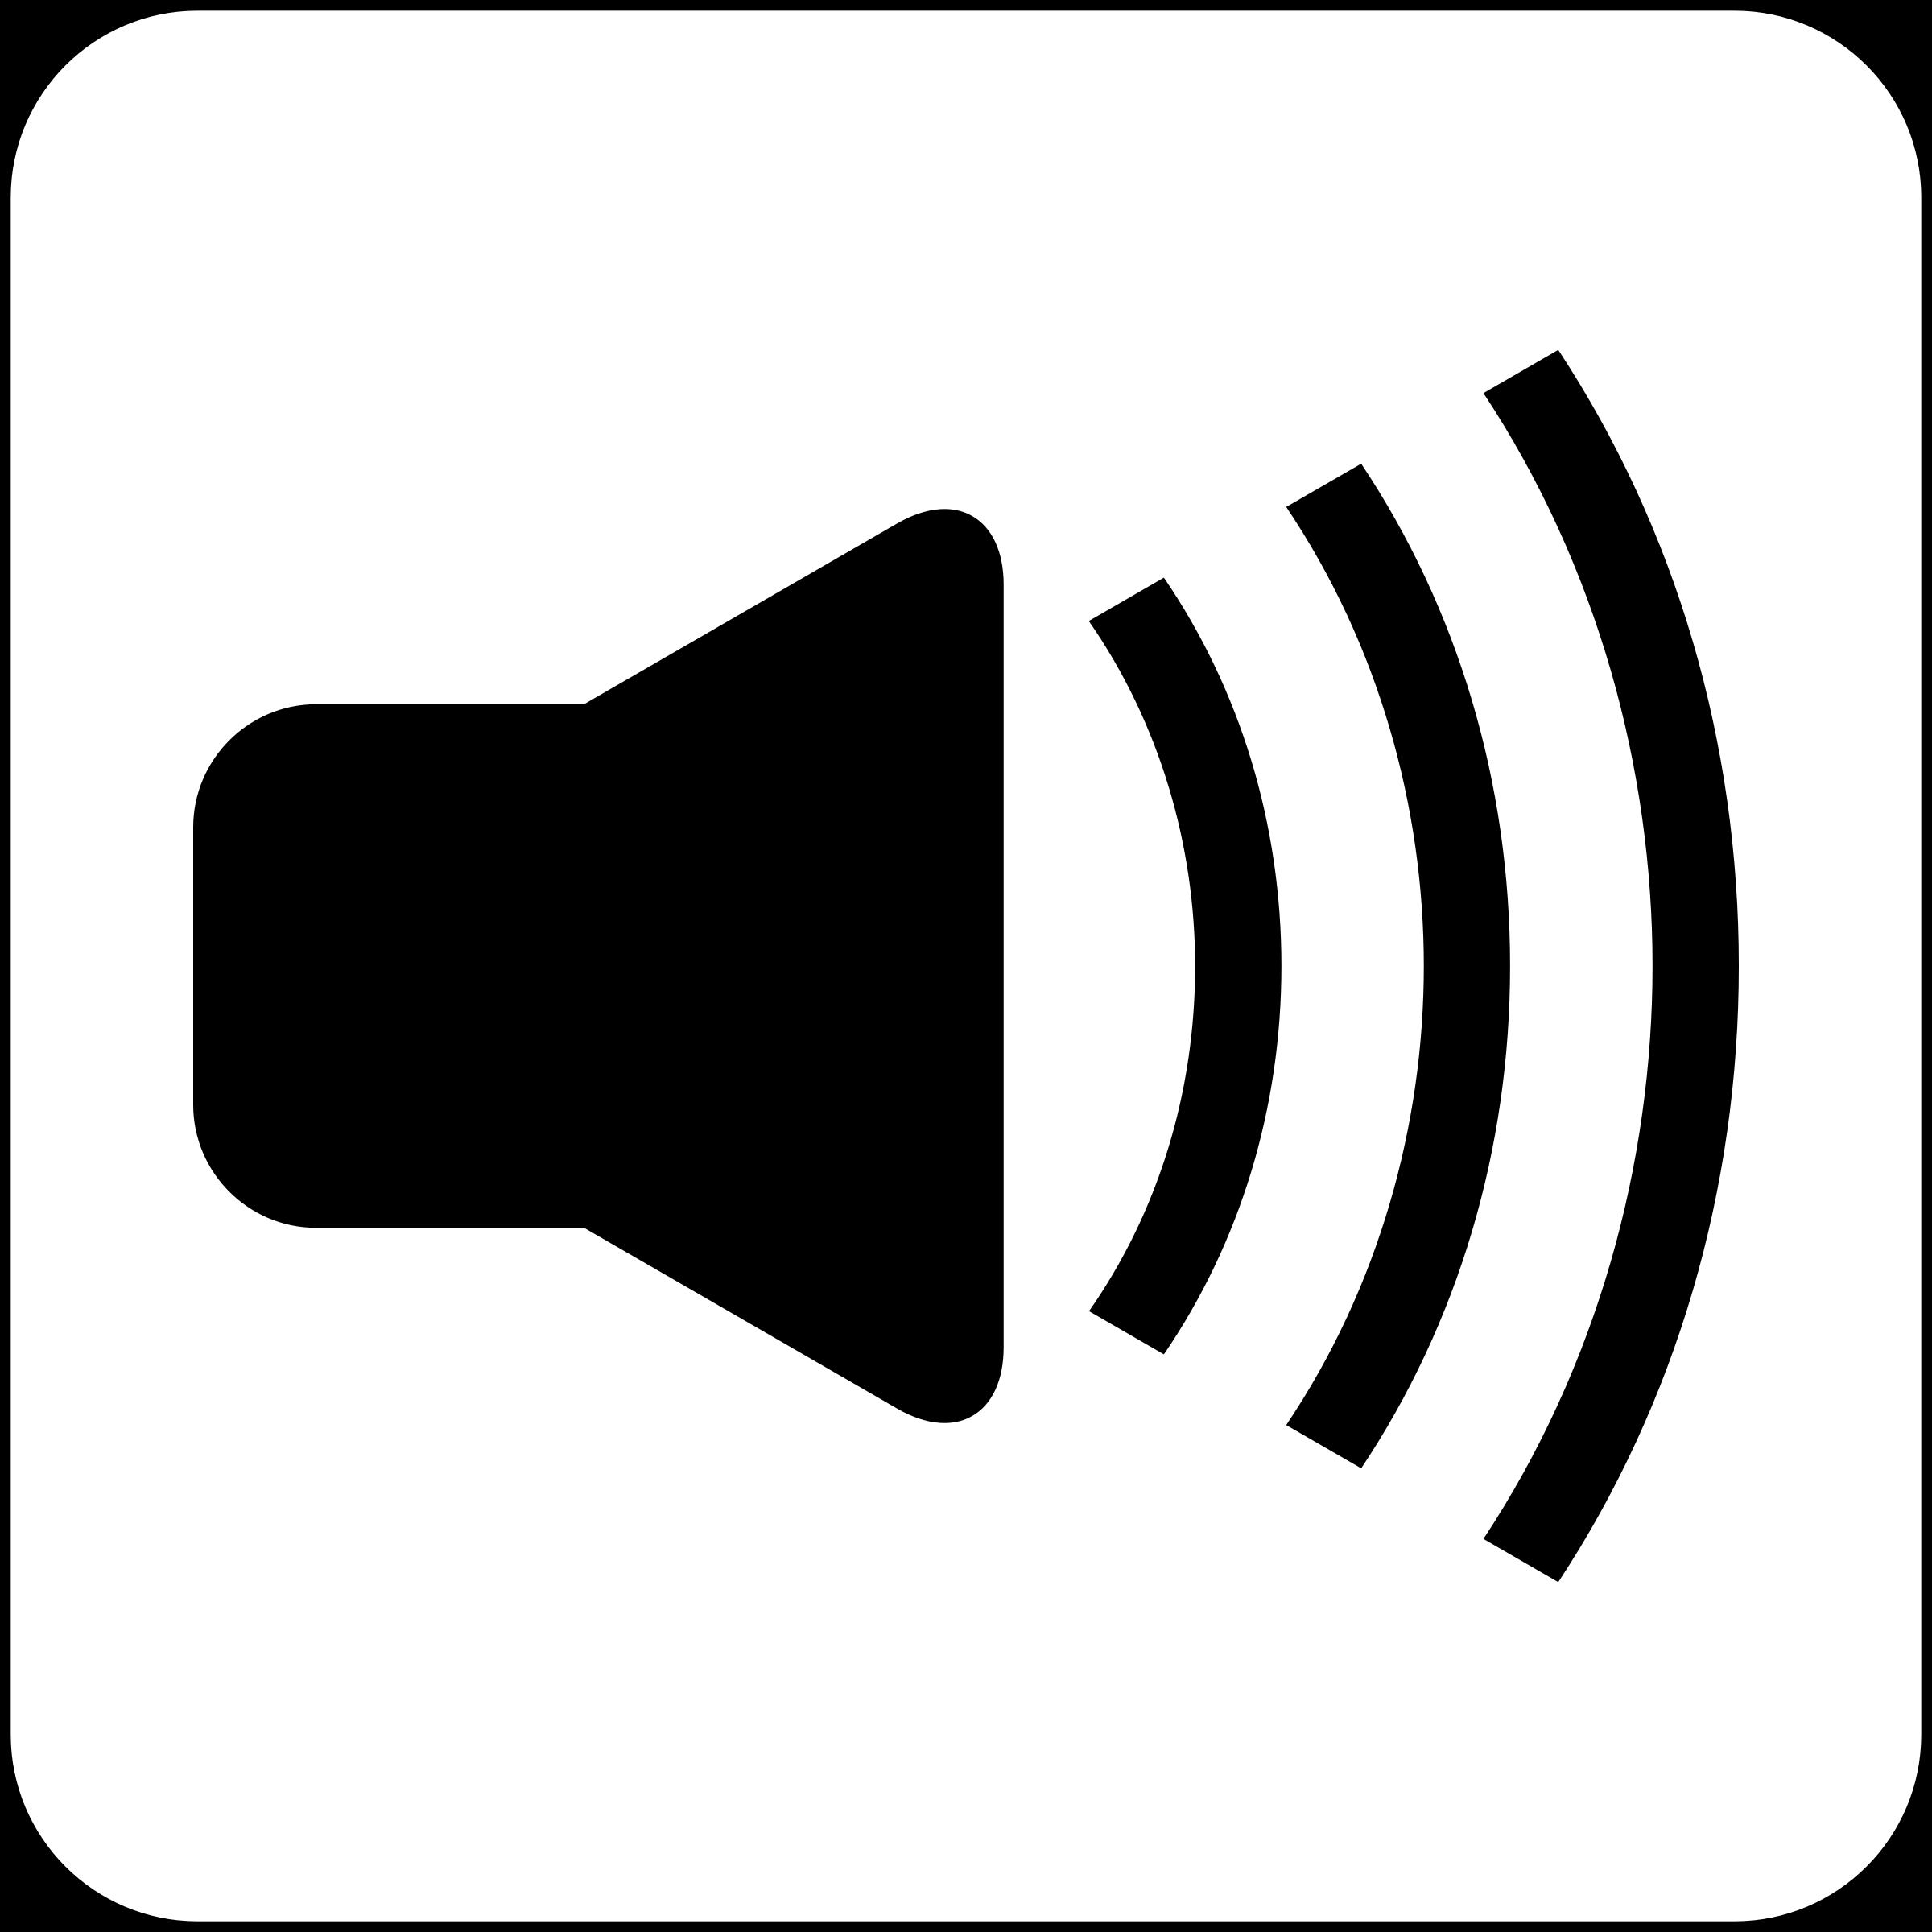 2400x2400 Microsoft Sounds Clipart